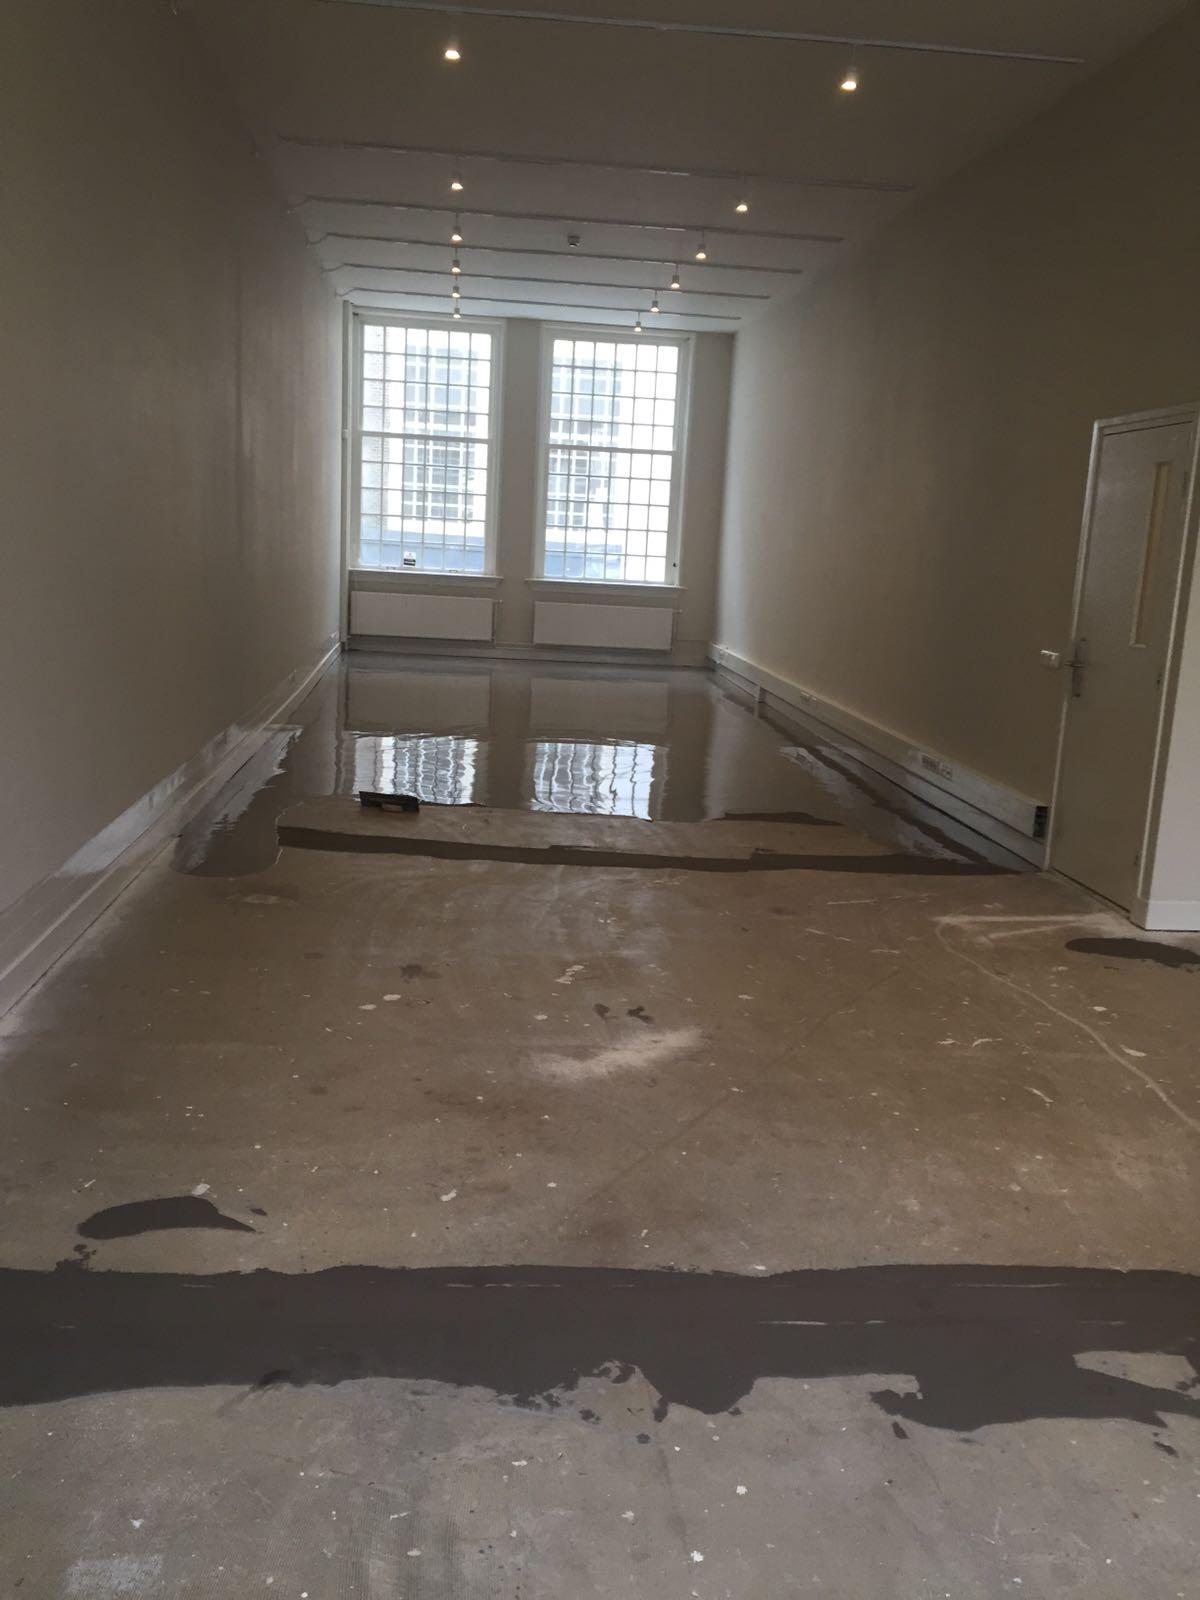 Cementgebonden gietvloer Amsterdam 90 m2 Best Vloerrenovatie Best Building Service B.V.